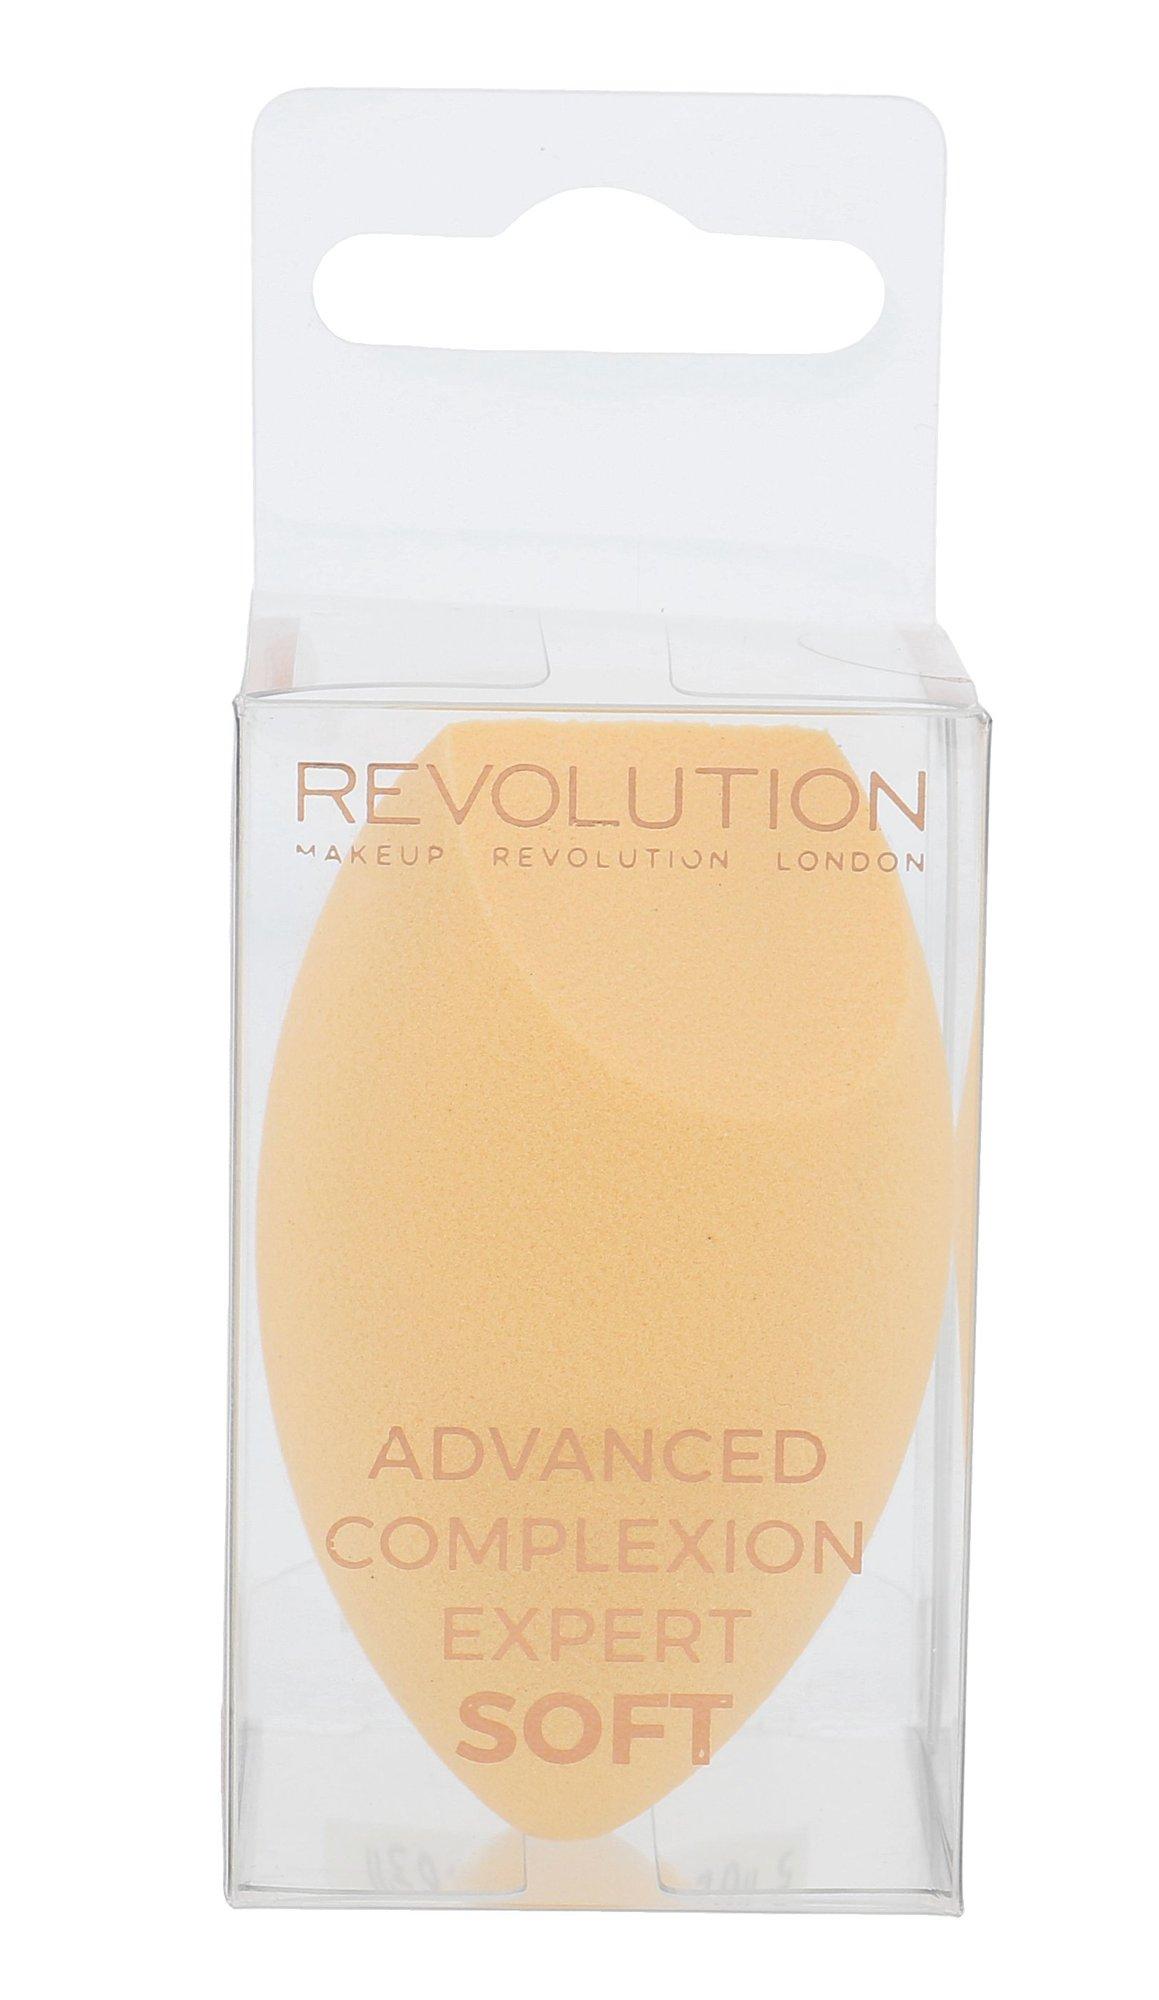 Makeup Revolution London Advanced Complexion Expert Soft Cosmetic 1ks